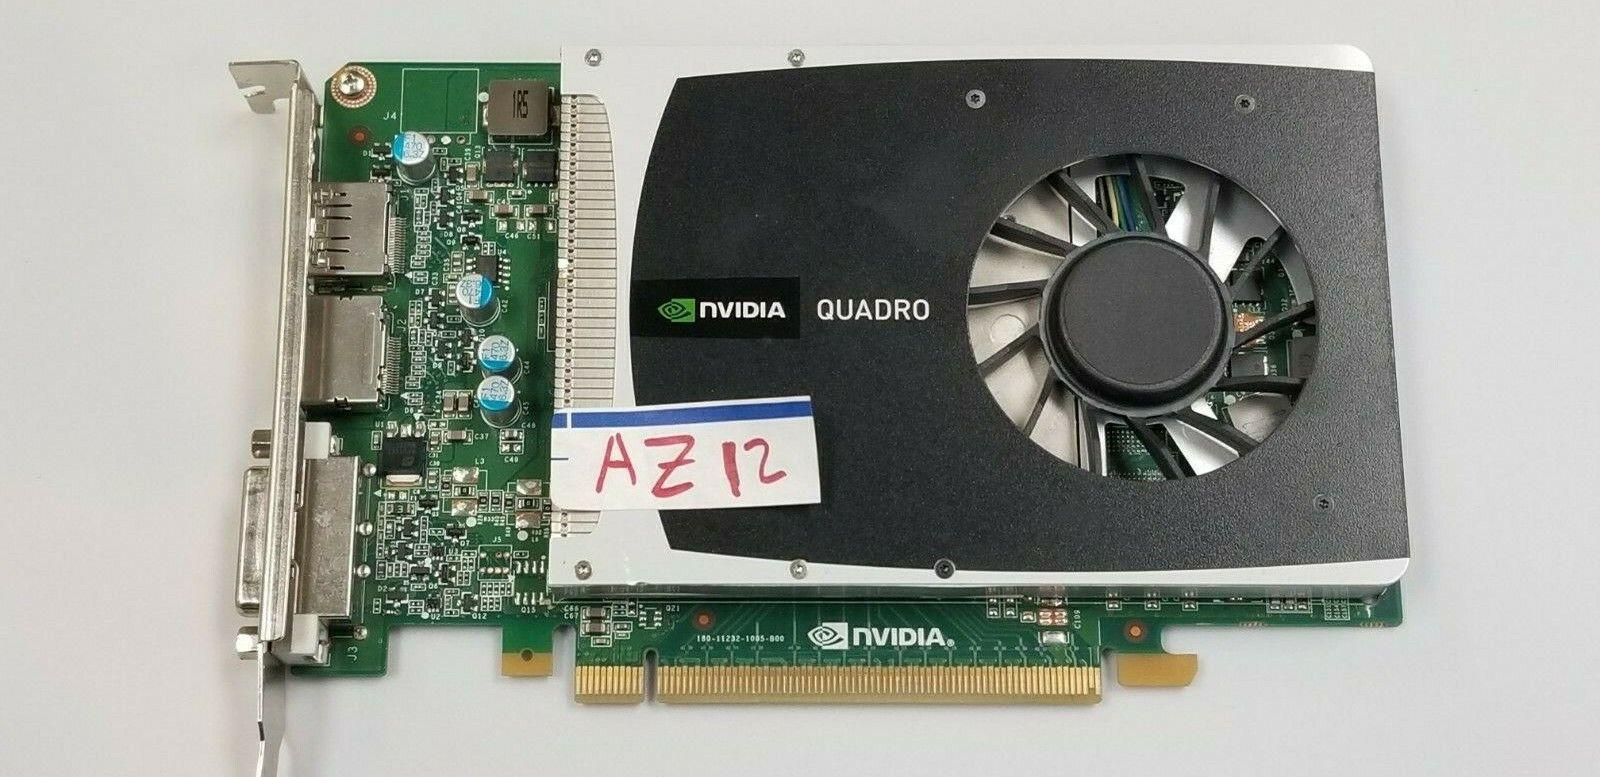 nVIDIA Quadro 2000 1GB GDDR5 Gaming GPU Card DVI DP PCI-E working #AZ12